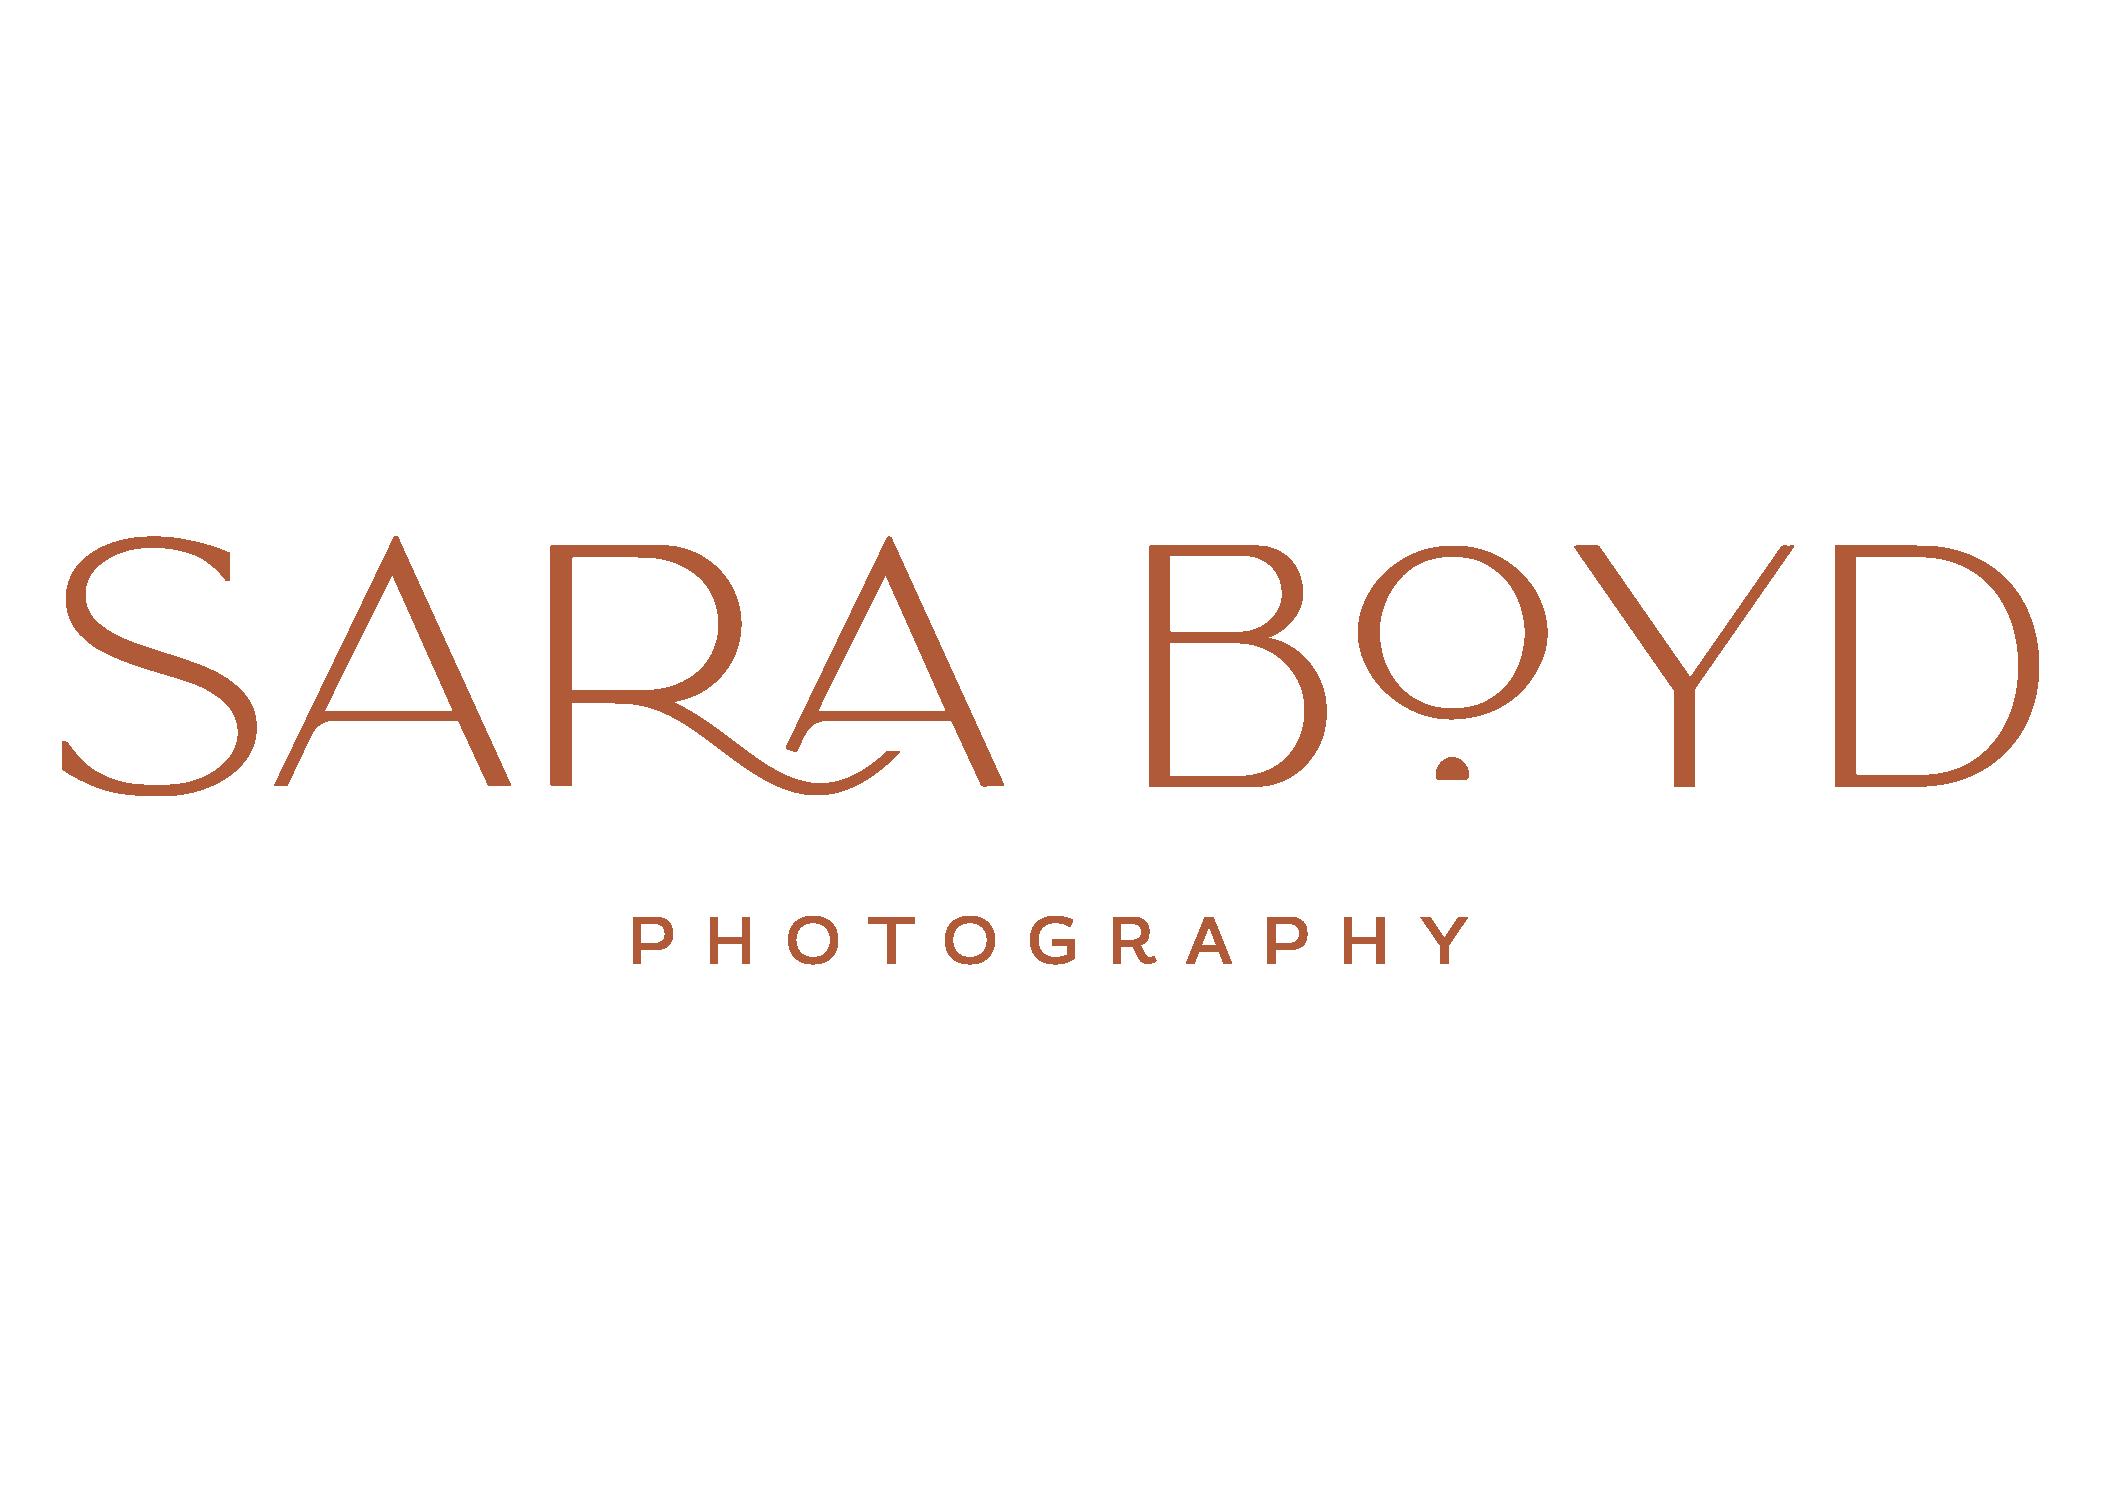 Sara Boyd Photography Photography